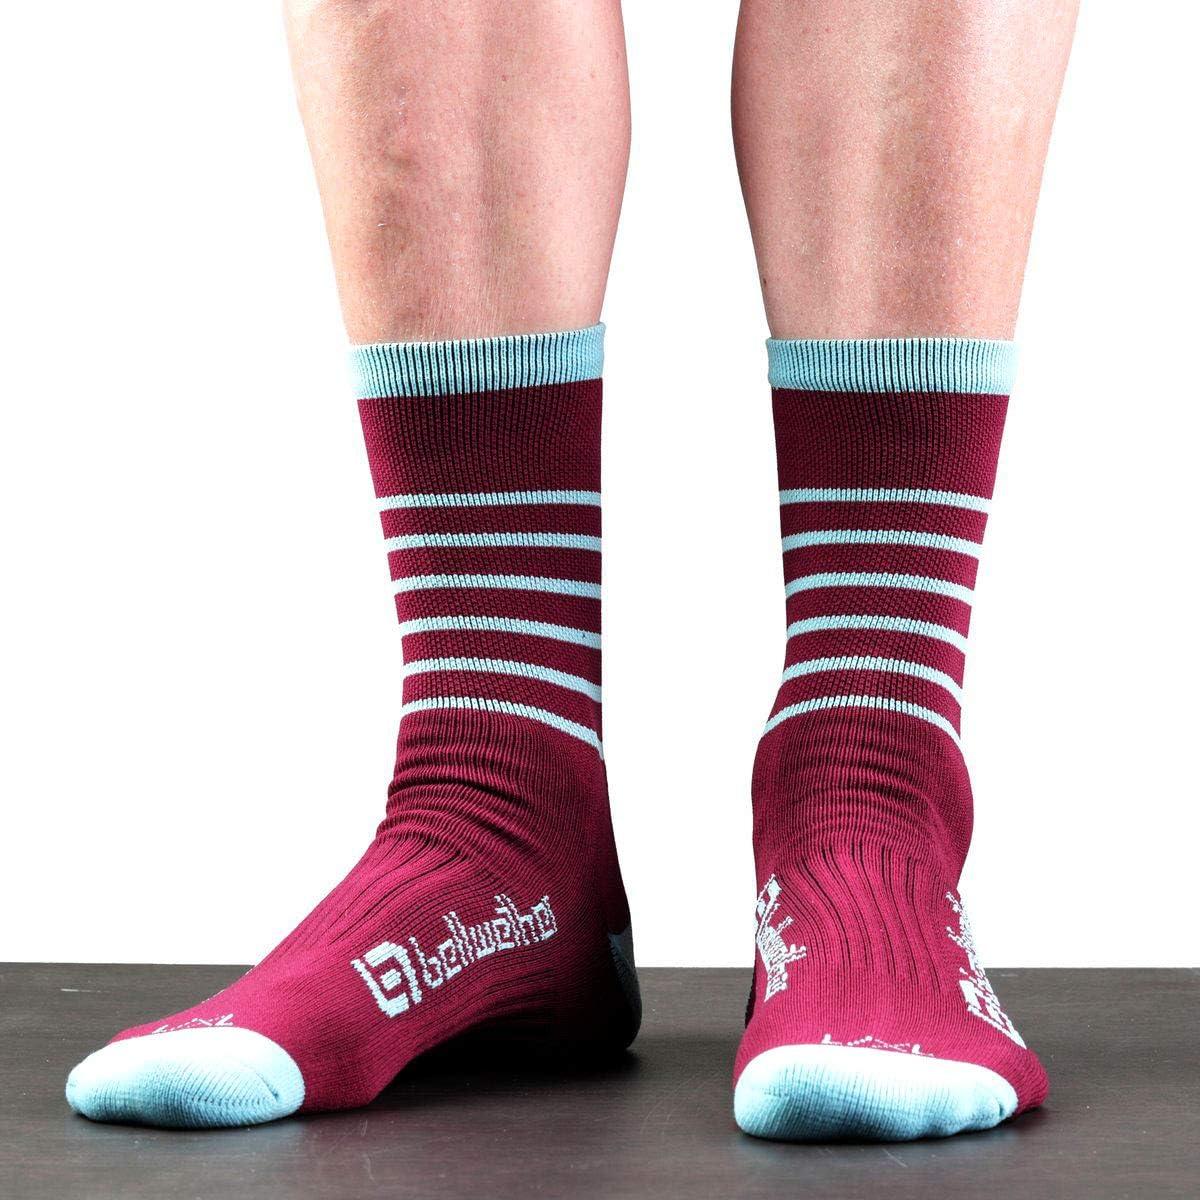 Bellwether Blitz Cycling Socks - Burgundy/Ice - 97440376